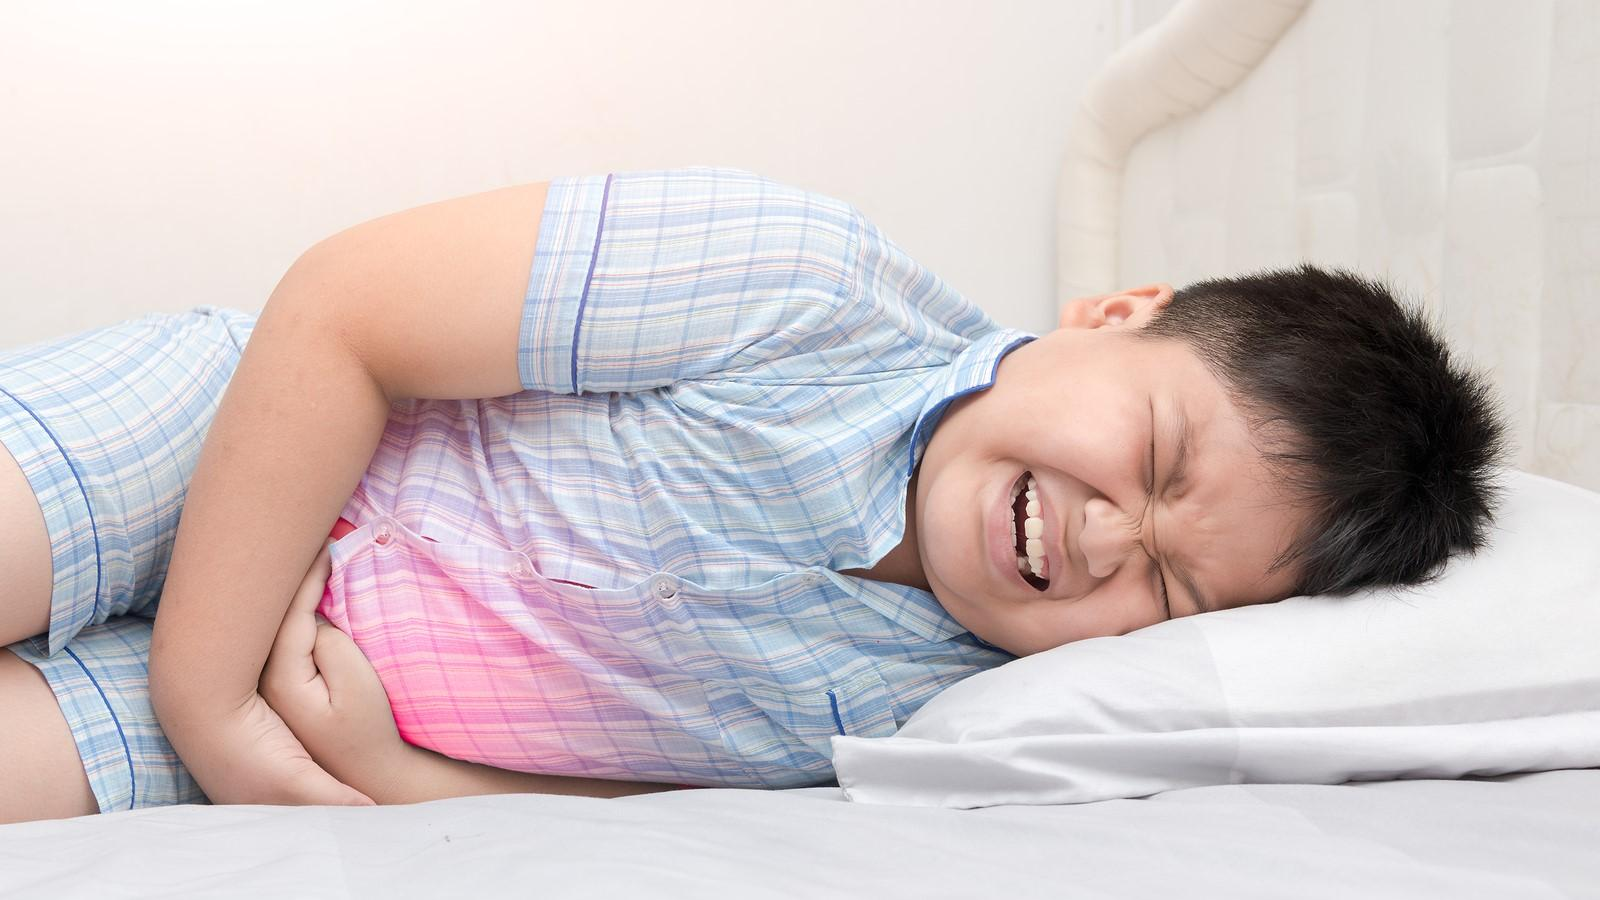 bauchschmerzen bei kindern was steckt dahinter. Black Bedroom Furniture Sets. Home Design Ideas